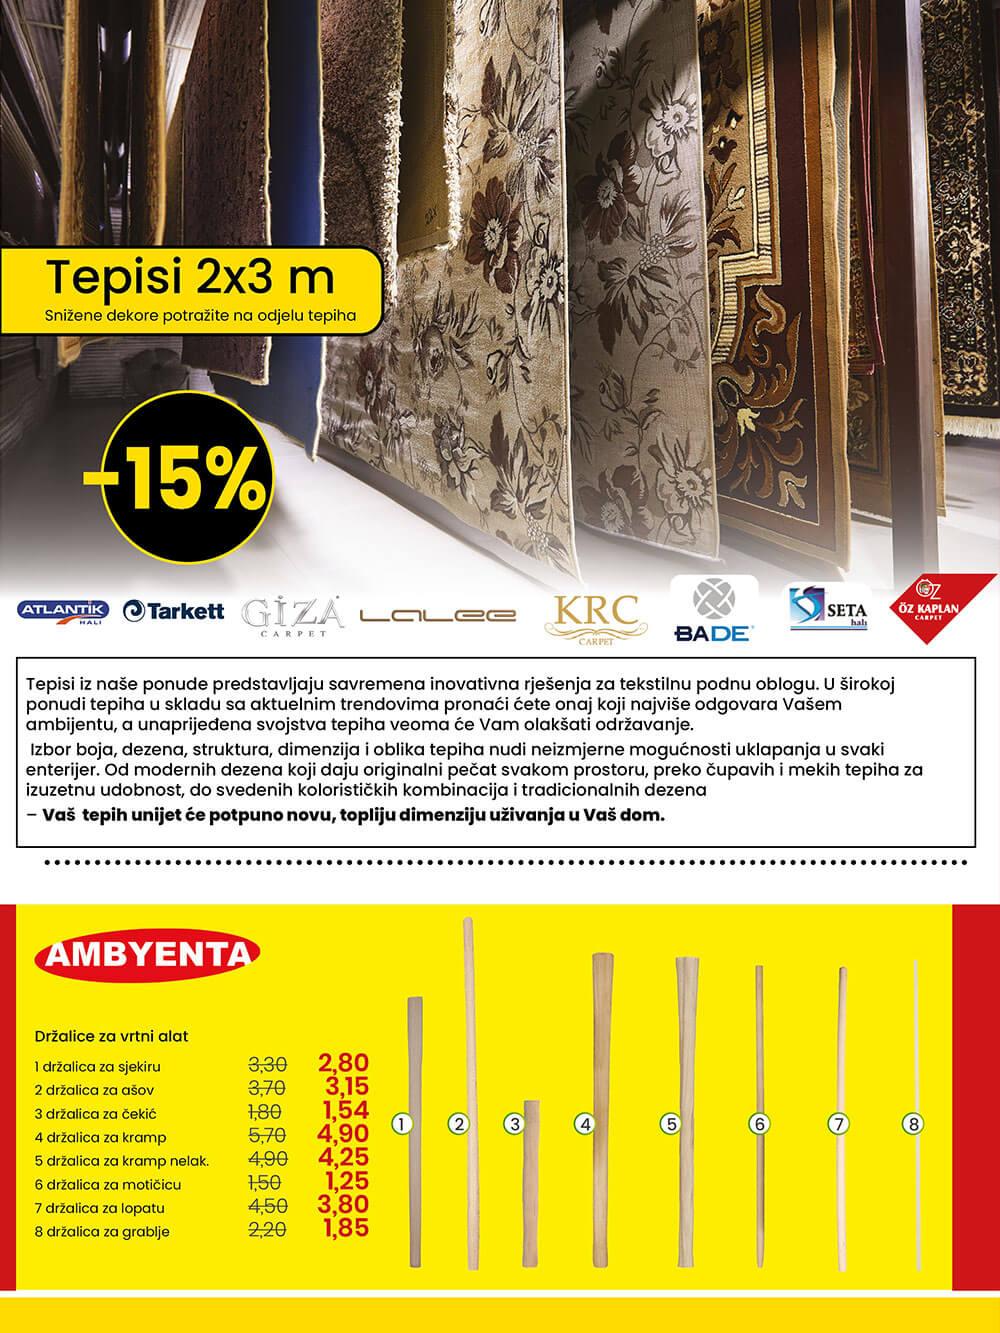 FIS Akcijski Katalog JUN 2021 eKatalozi.com 04.06. 23.06. 45